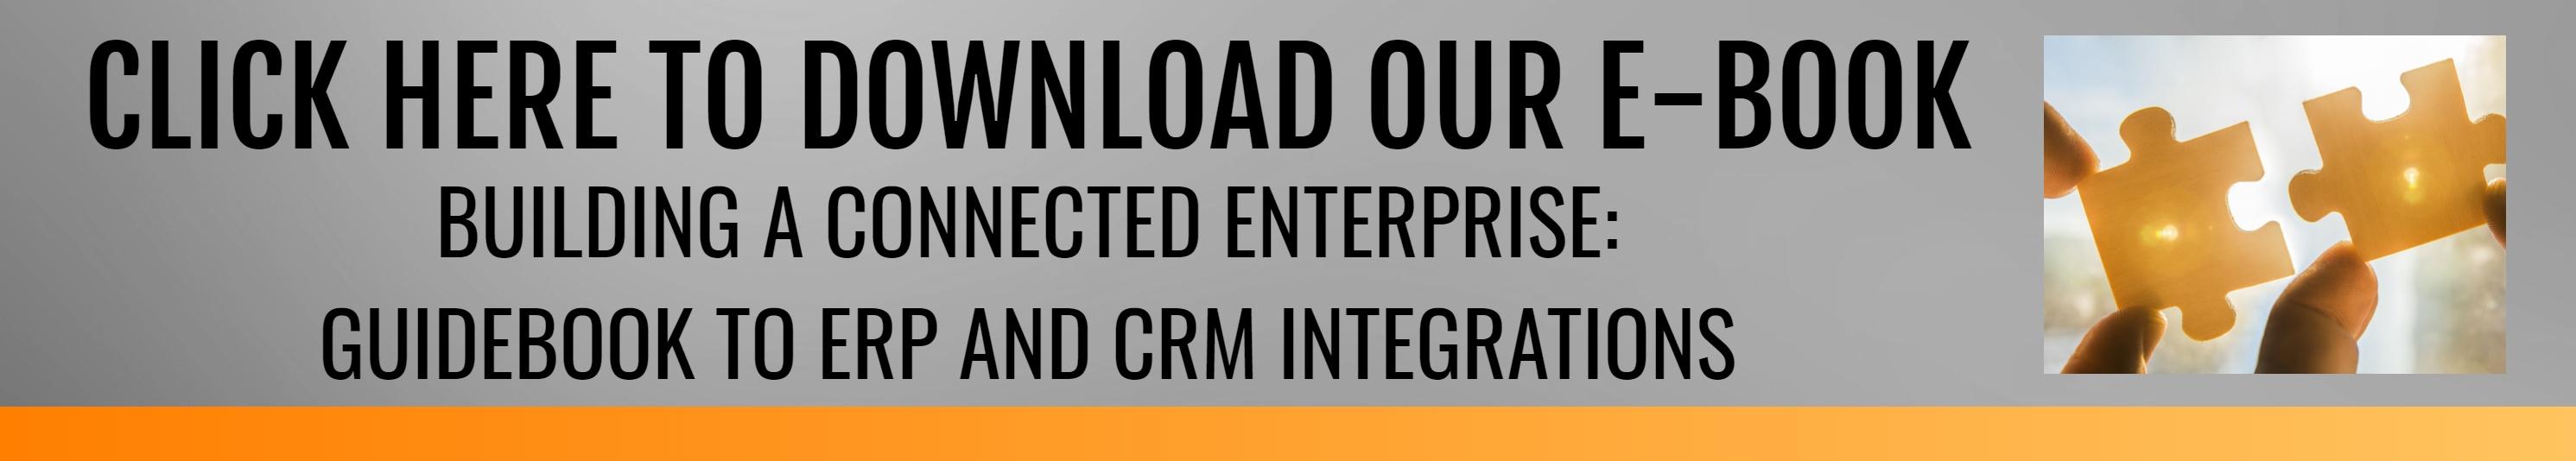 Integration E-Book Download